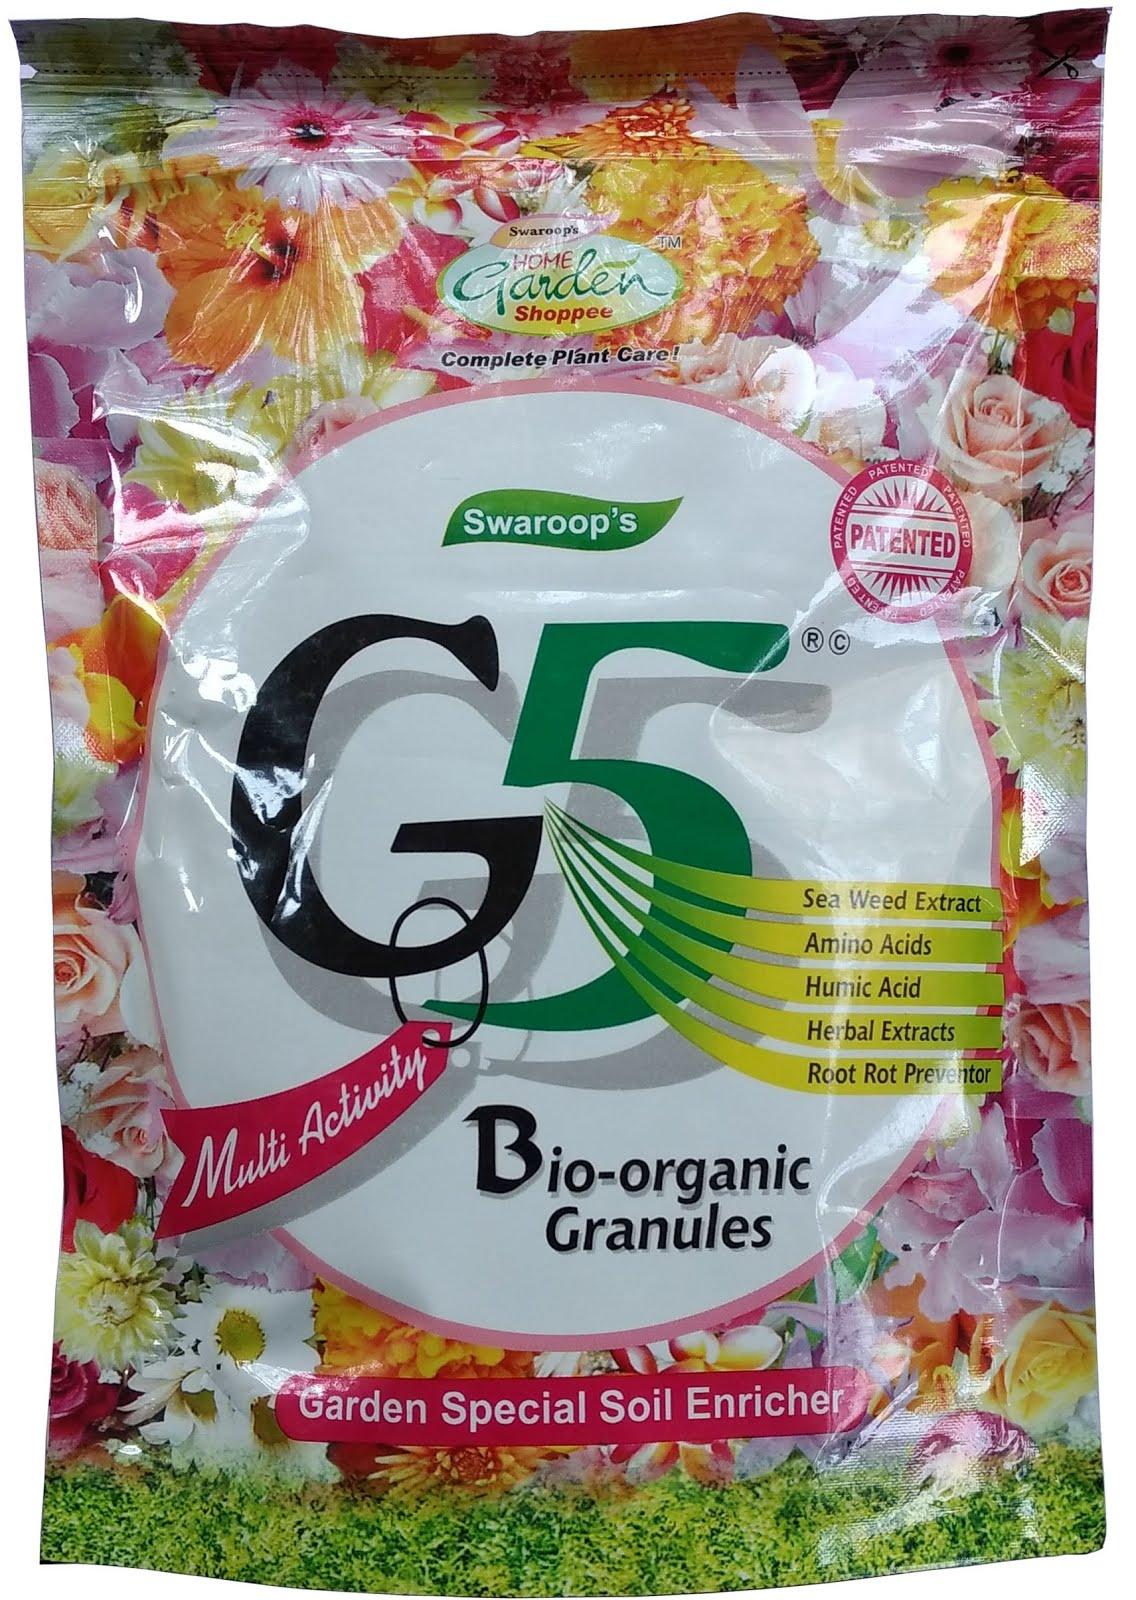 G5 Granules - Organic Manure